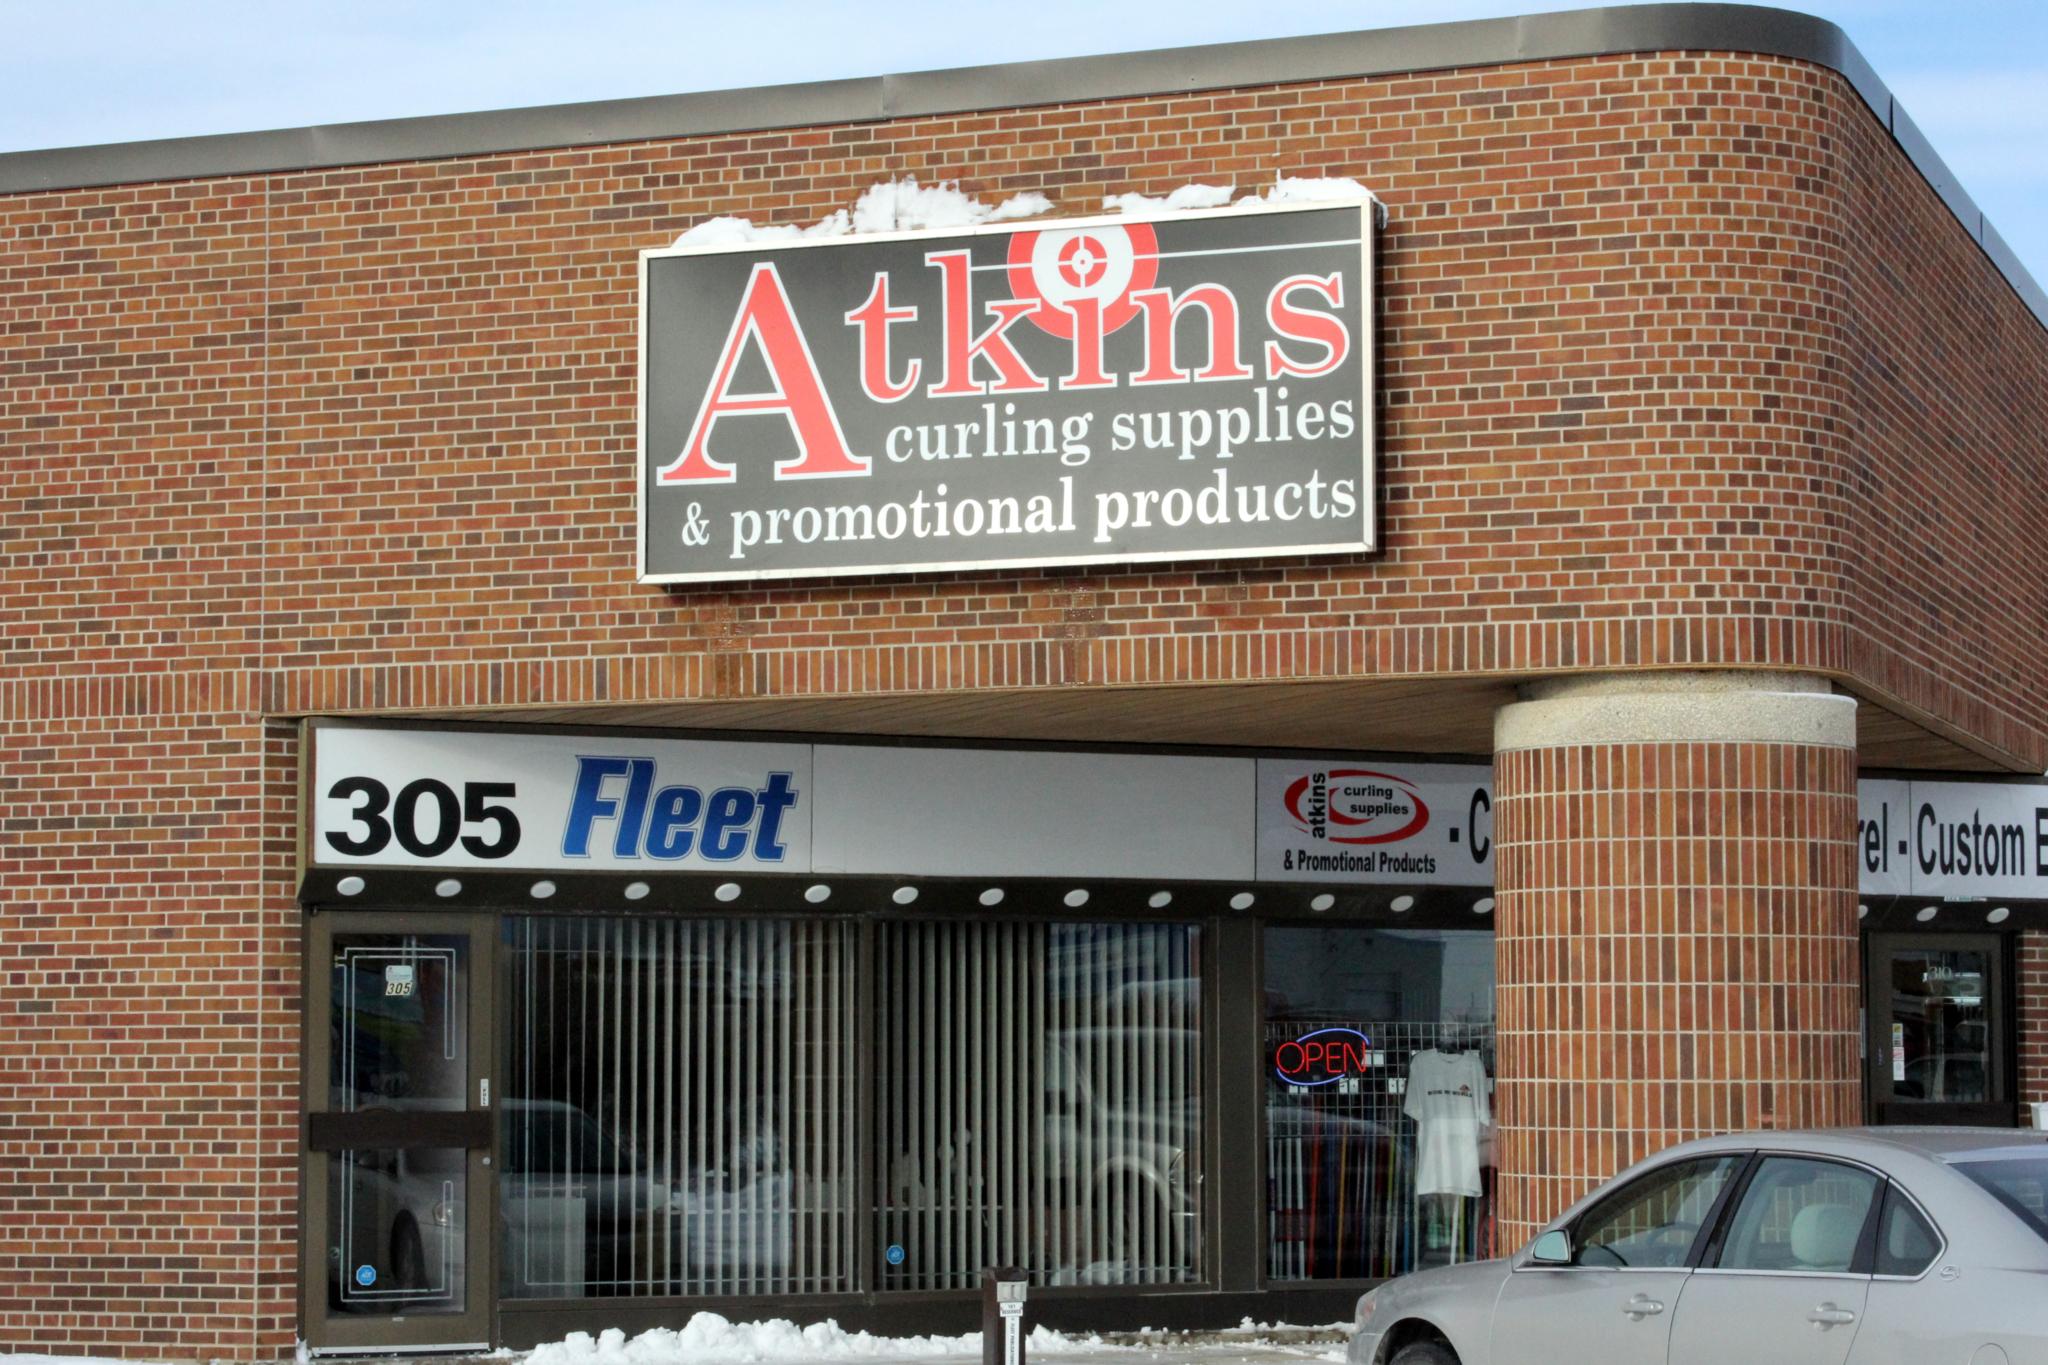 Atkins Curling Supplies